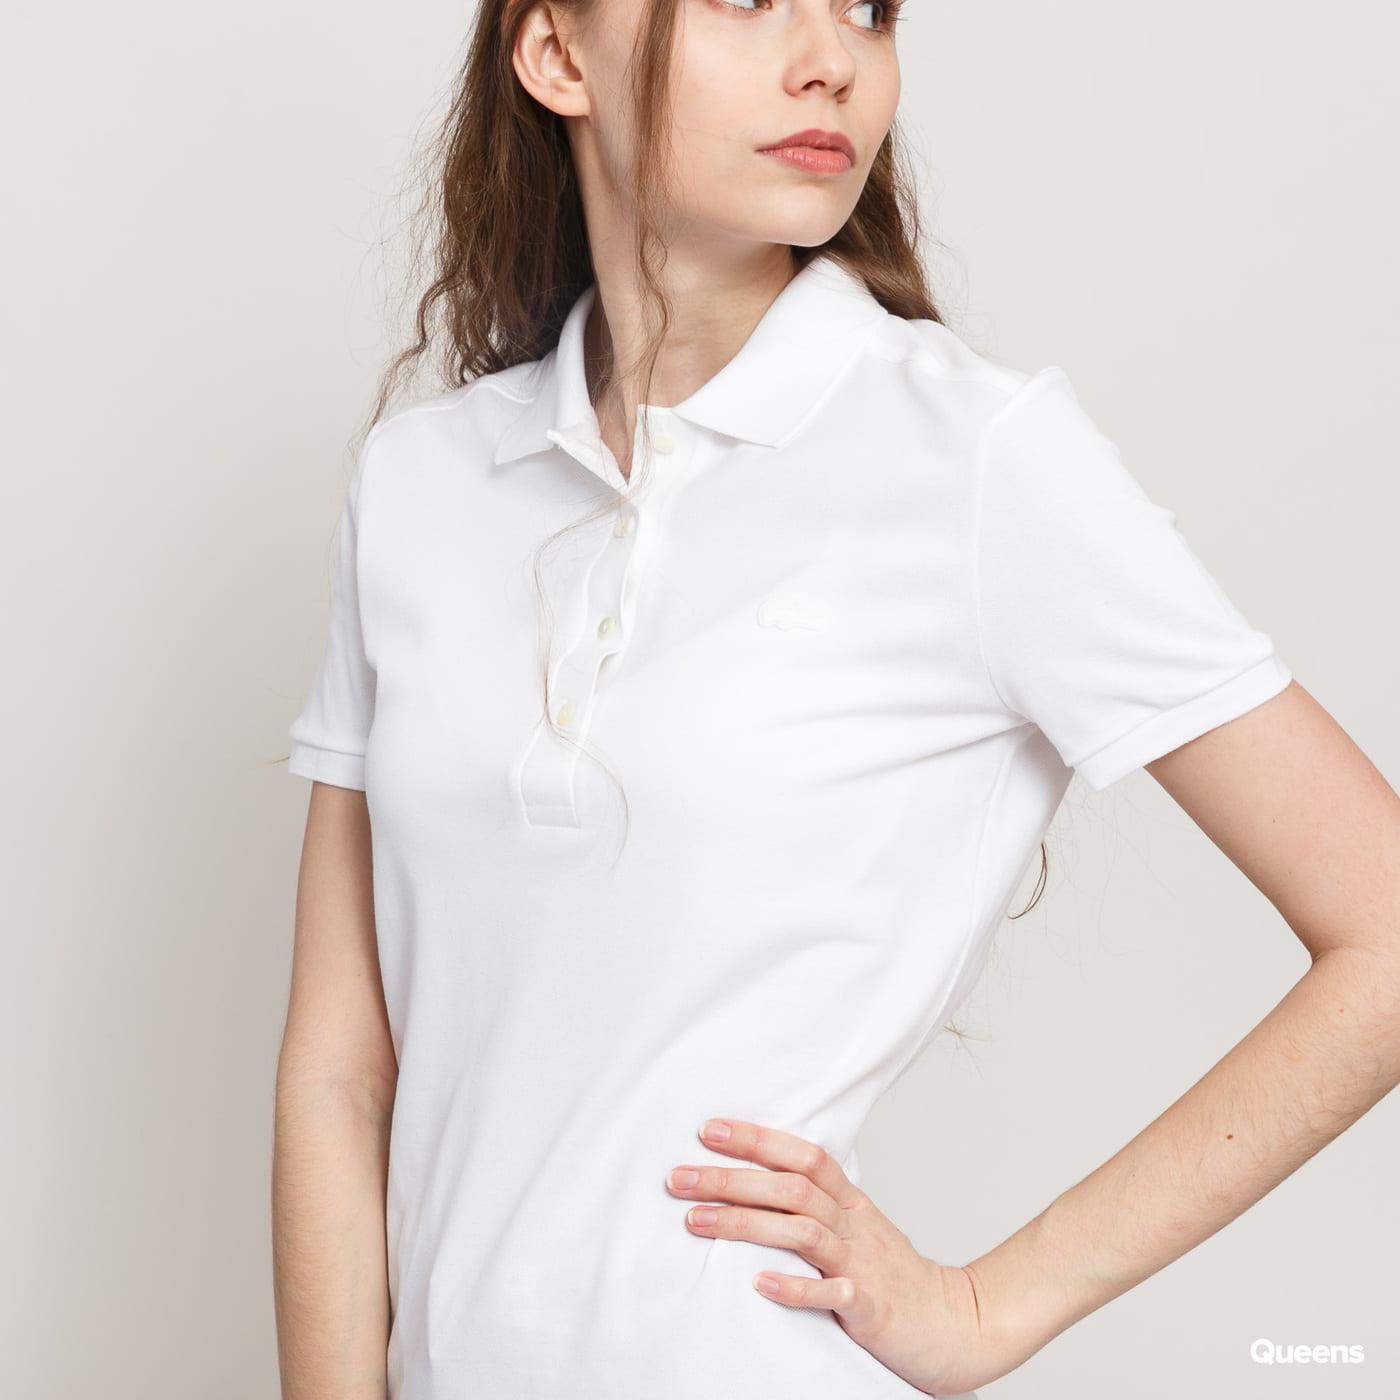 LACOSTE Women's Polo T-Shirt blau / türkis